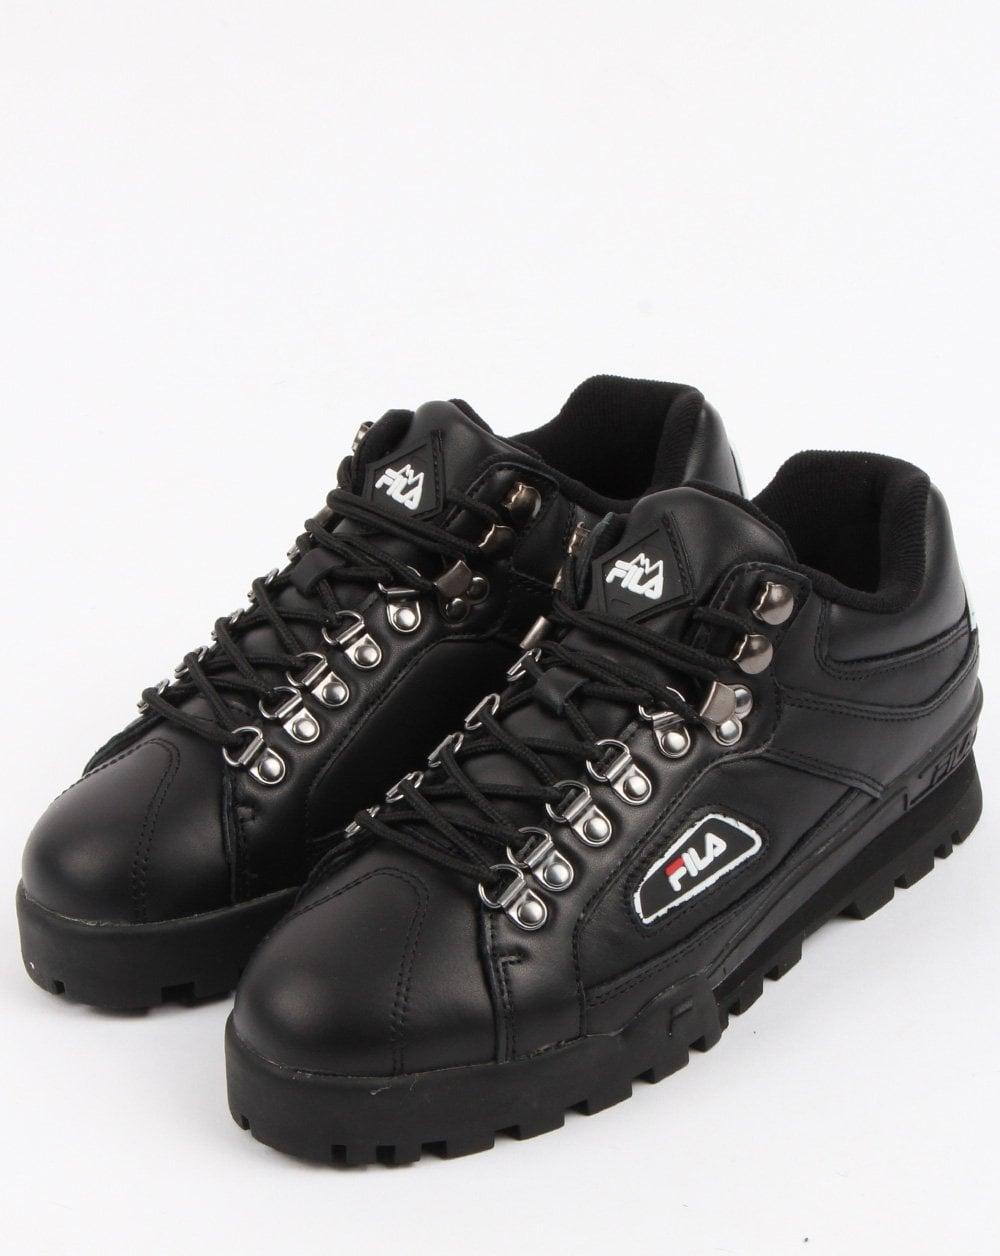 93984c8c6e34 Fila Vintage Trailblazer Hiking Boots Black